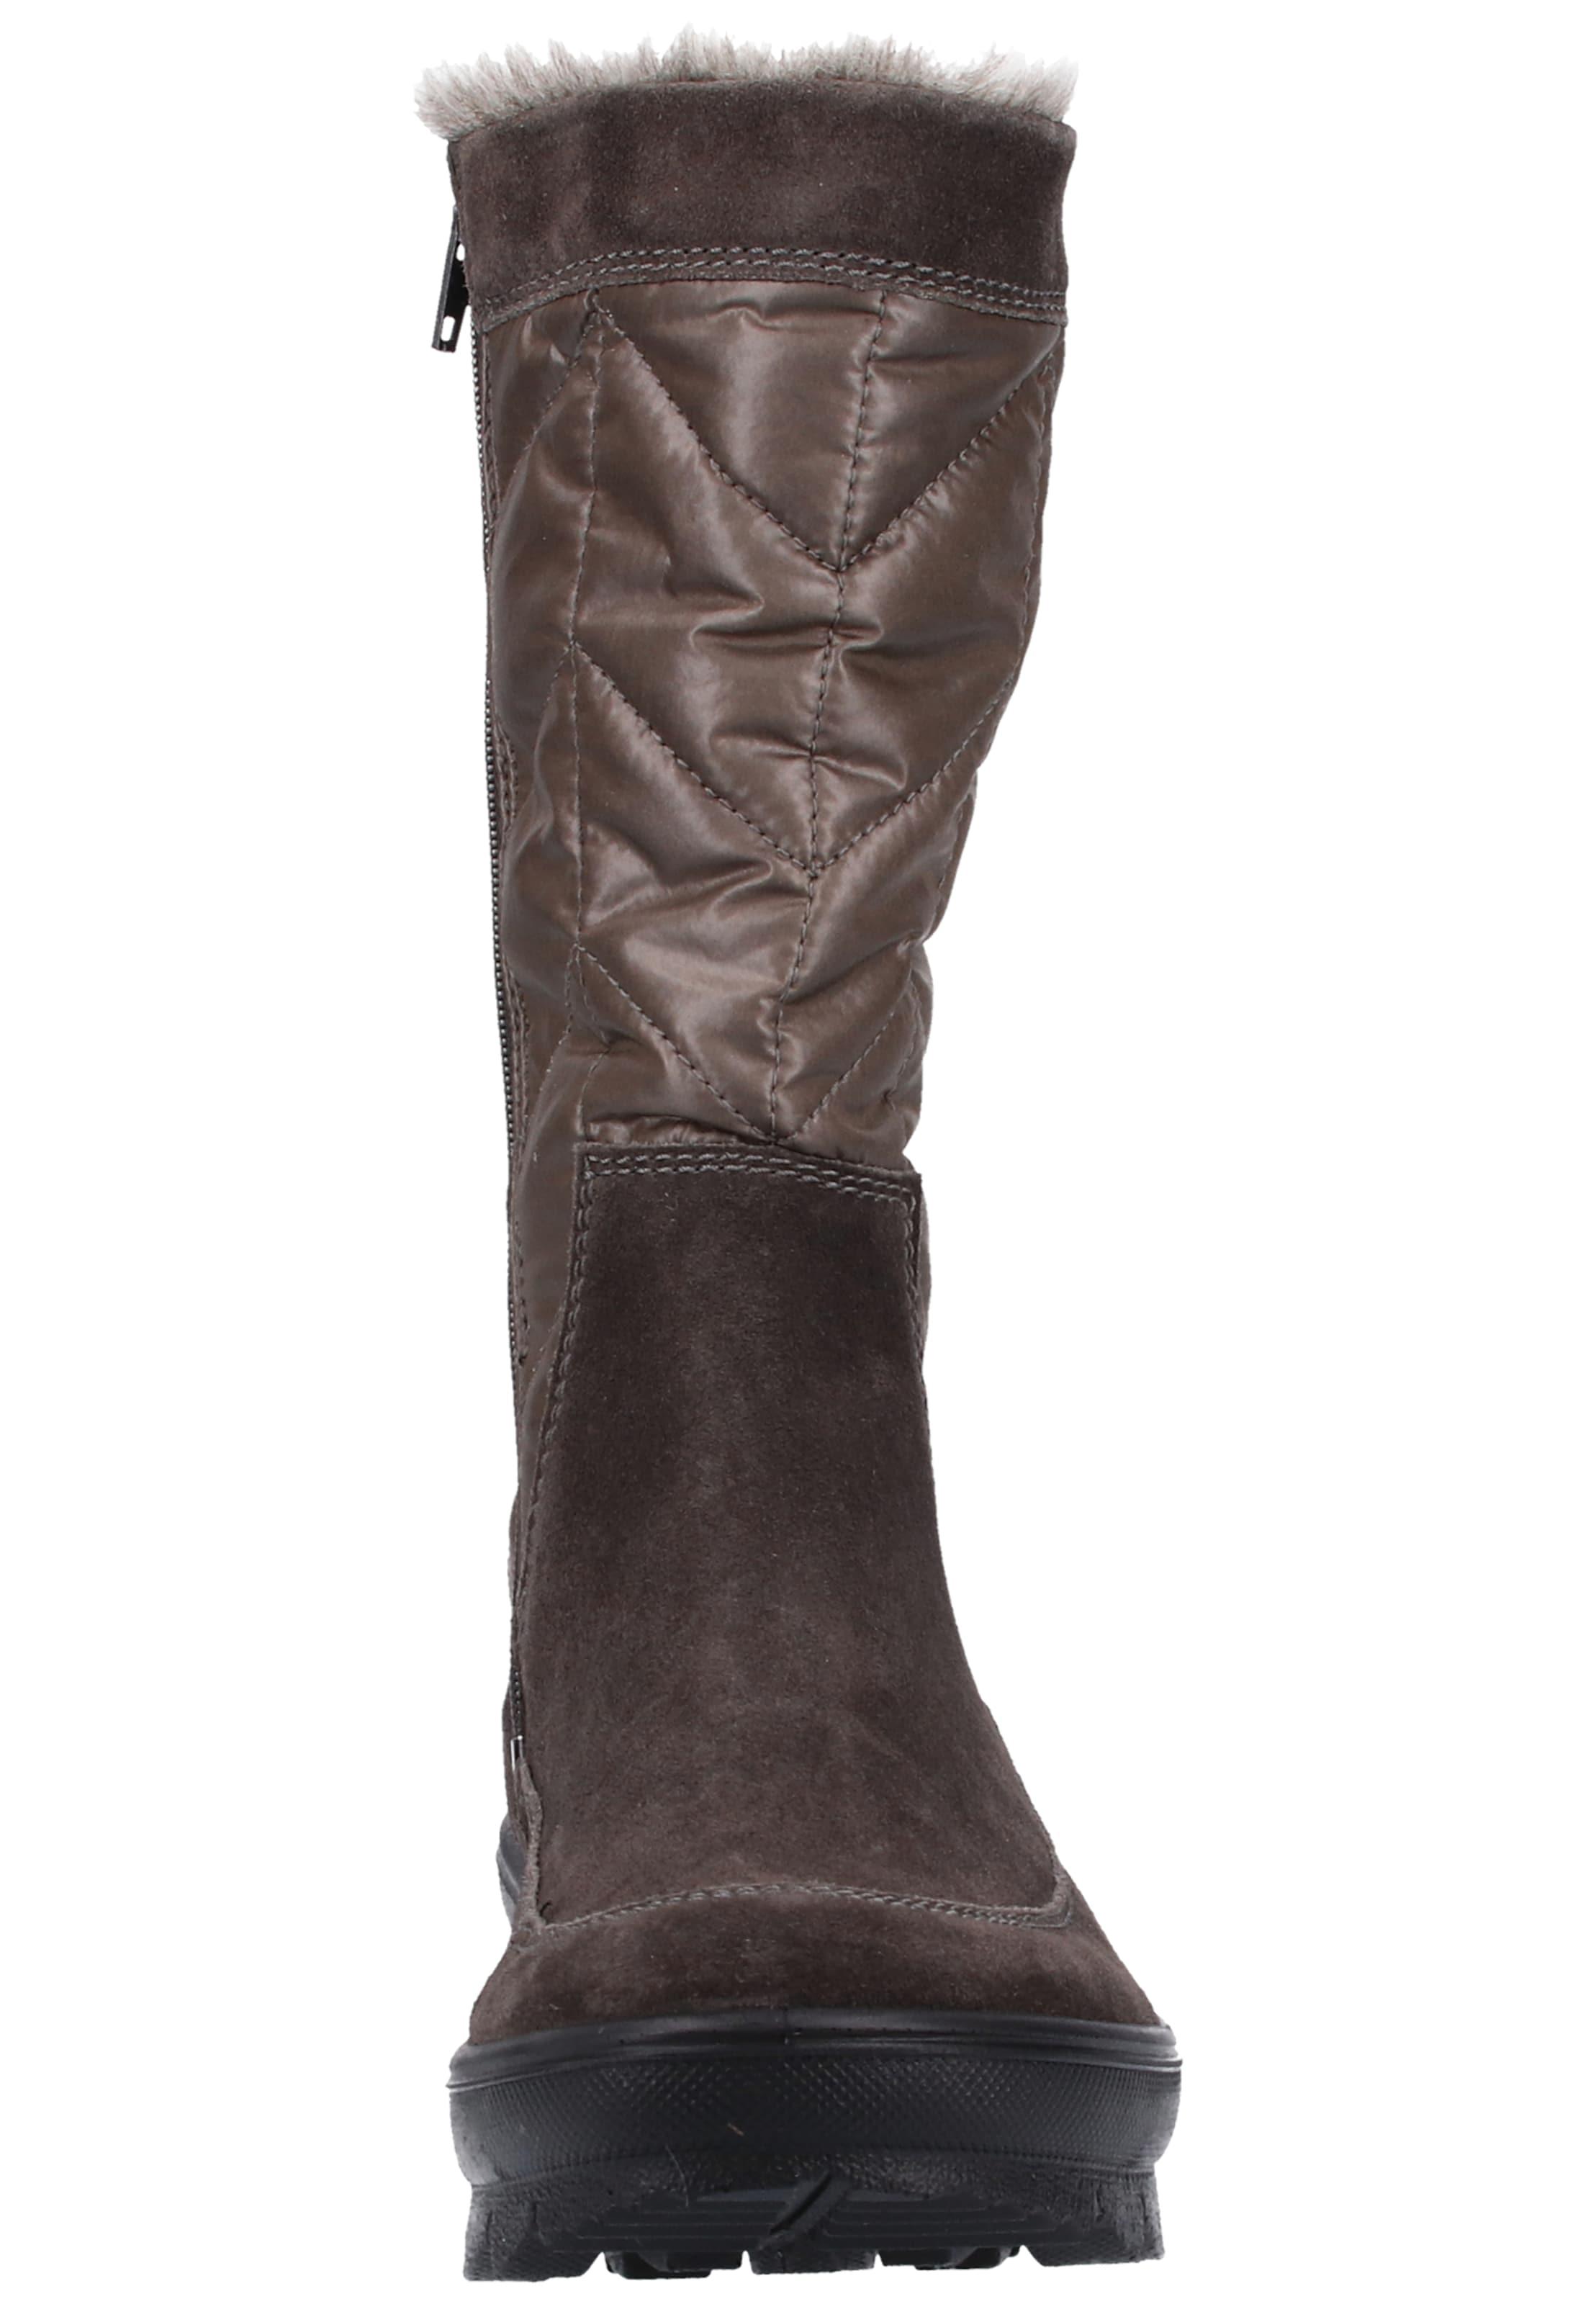 Stiefel In Stiefel Grau Grau Stiefel Legero Legero Legero In hCtsrdQ